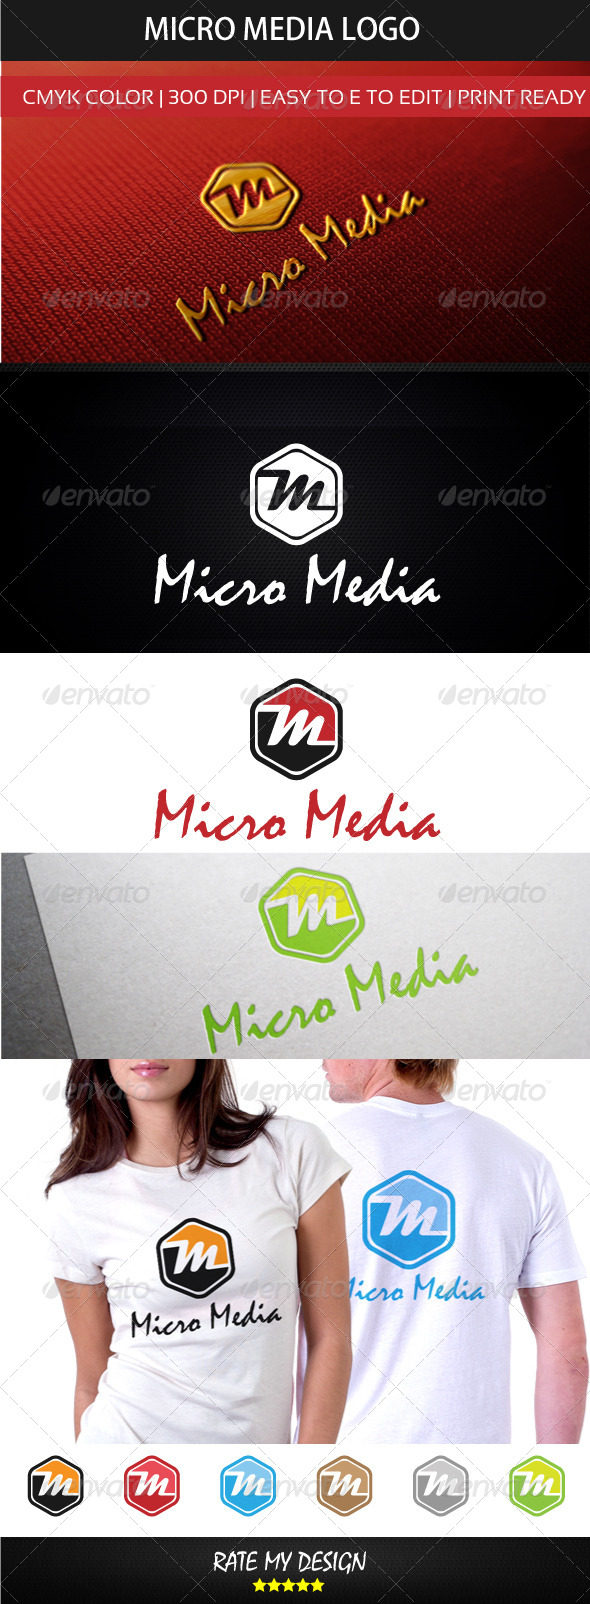 Micro Media